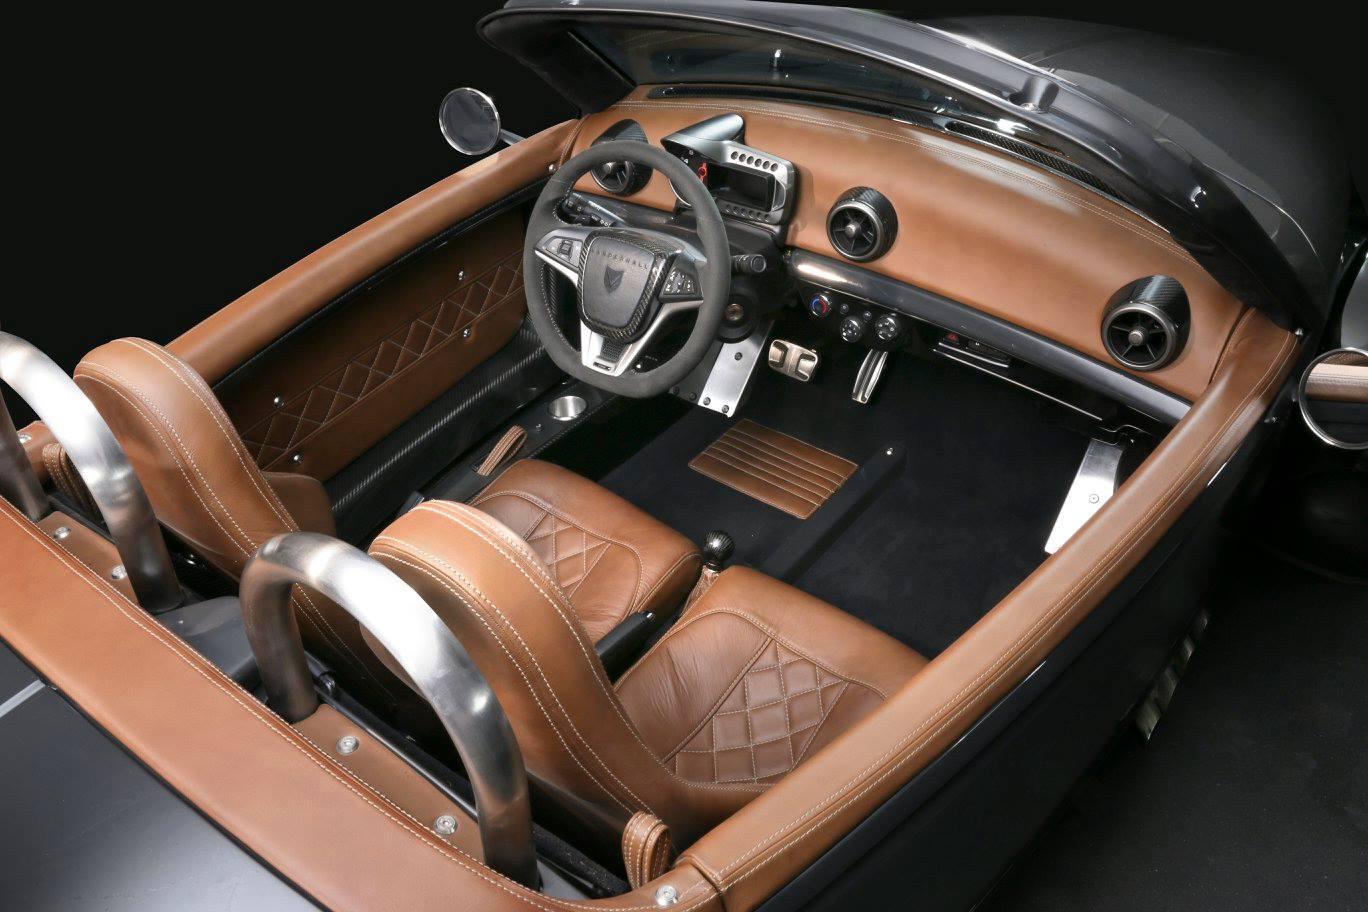 Awesome Luxury Vanderhall Laguna Three Wheeler Roadster